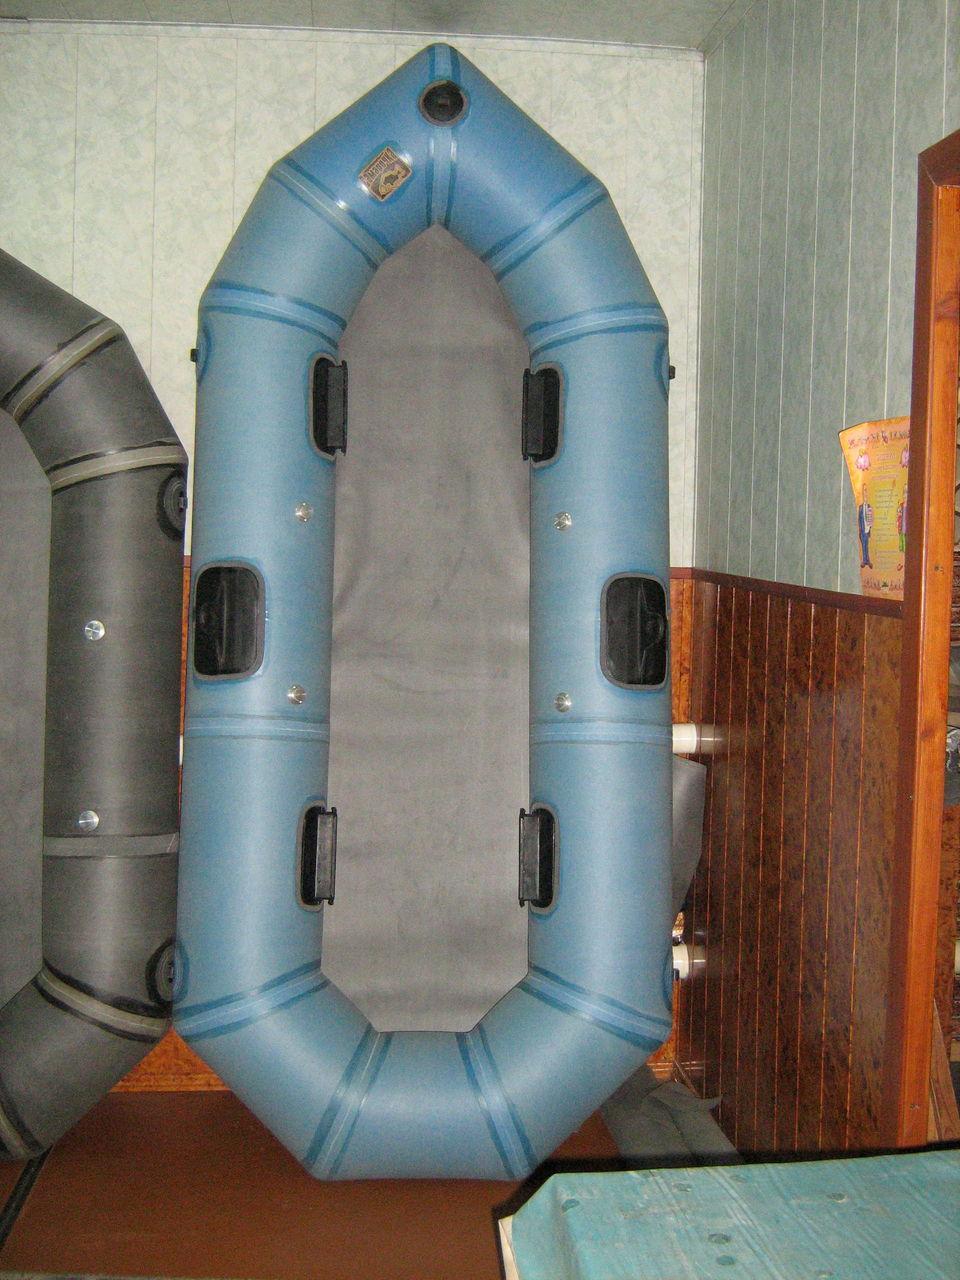 производители резиновых лодок самарочка